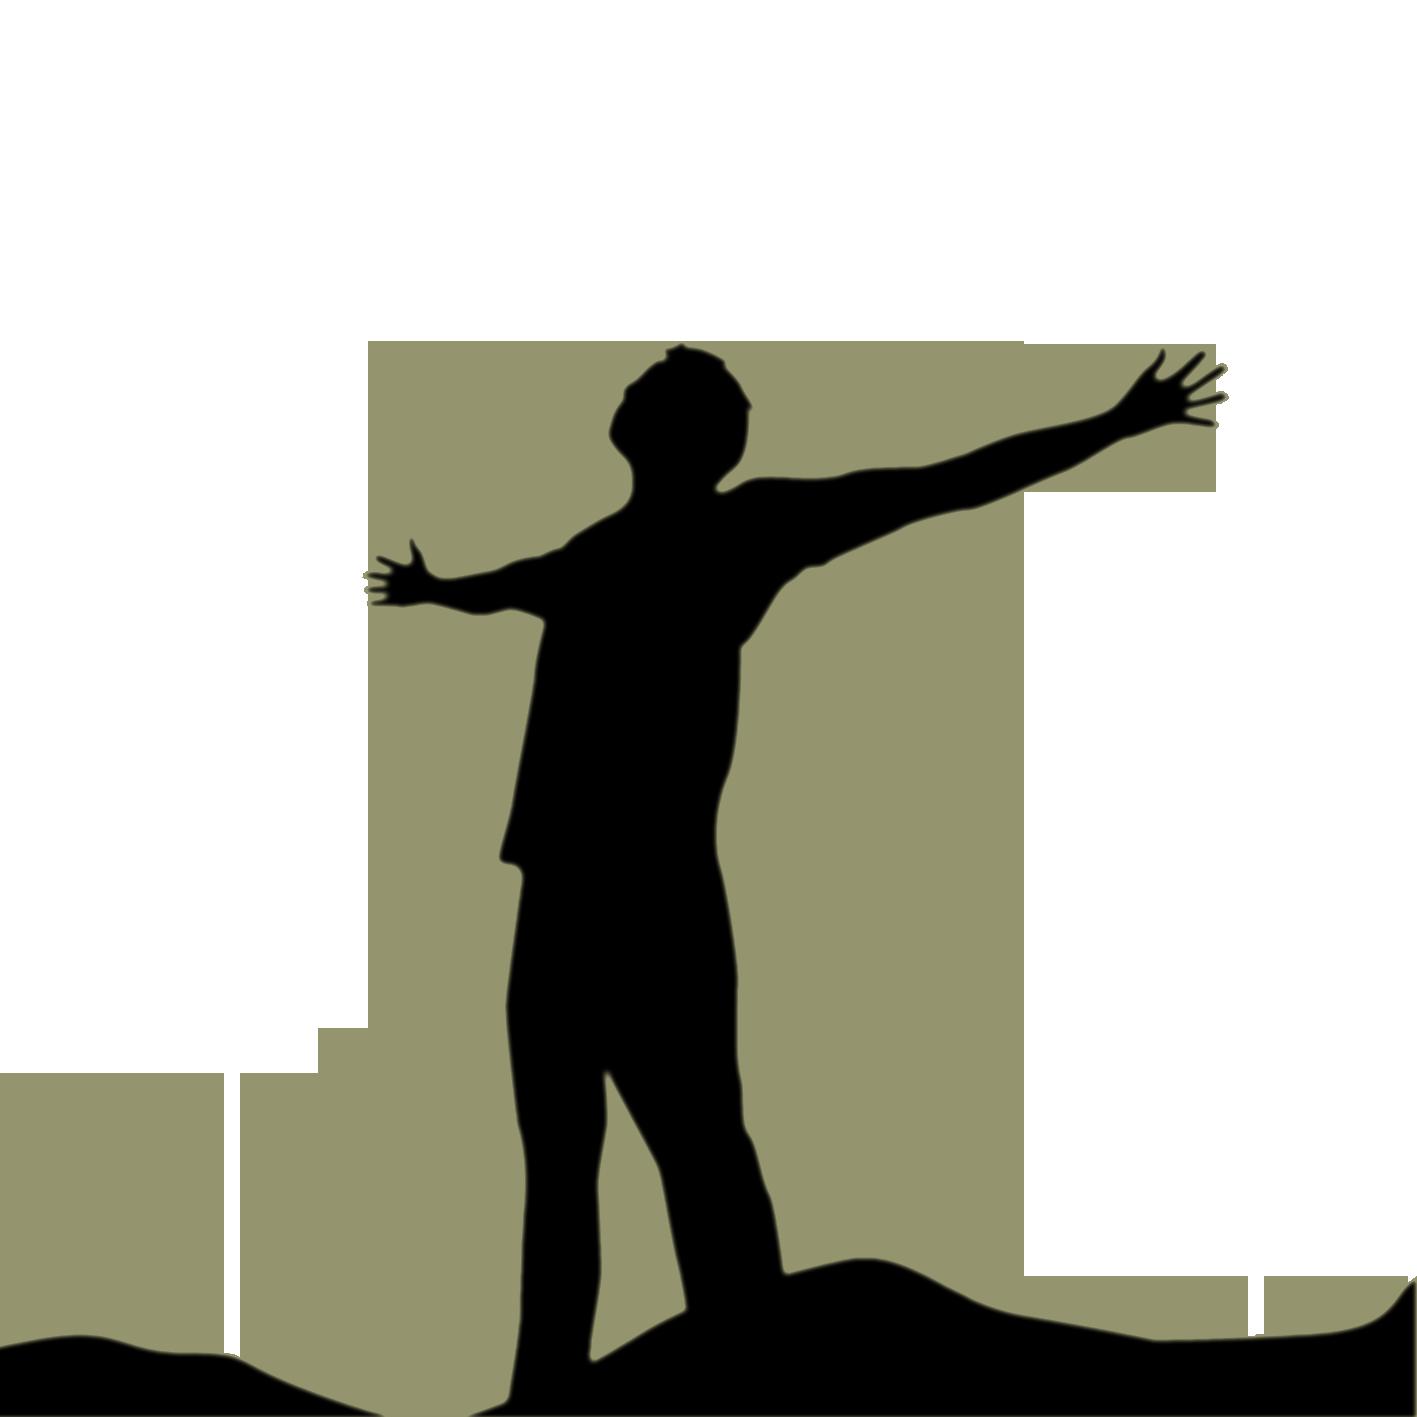 Worship Clipart & Worship Clip Art Images.